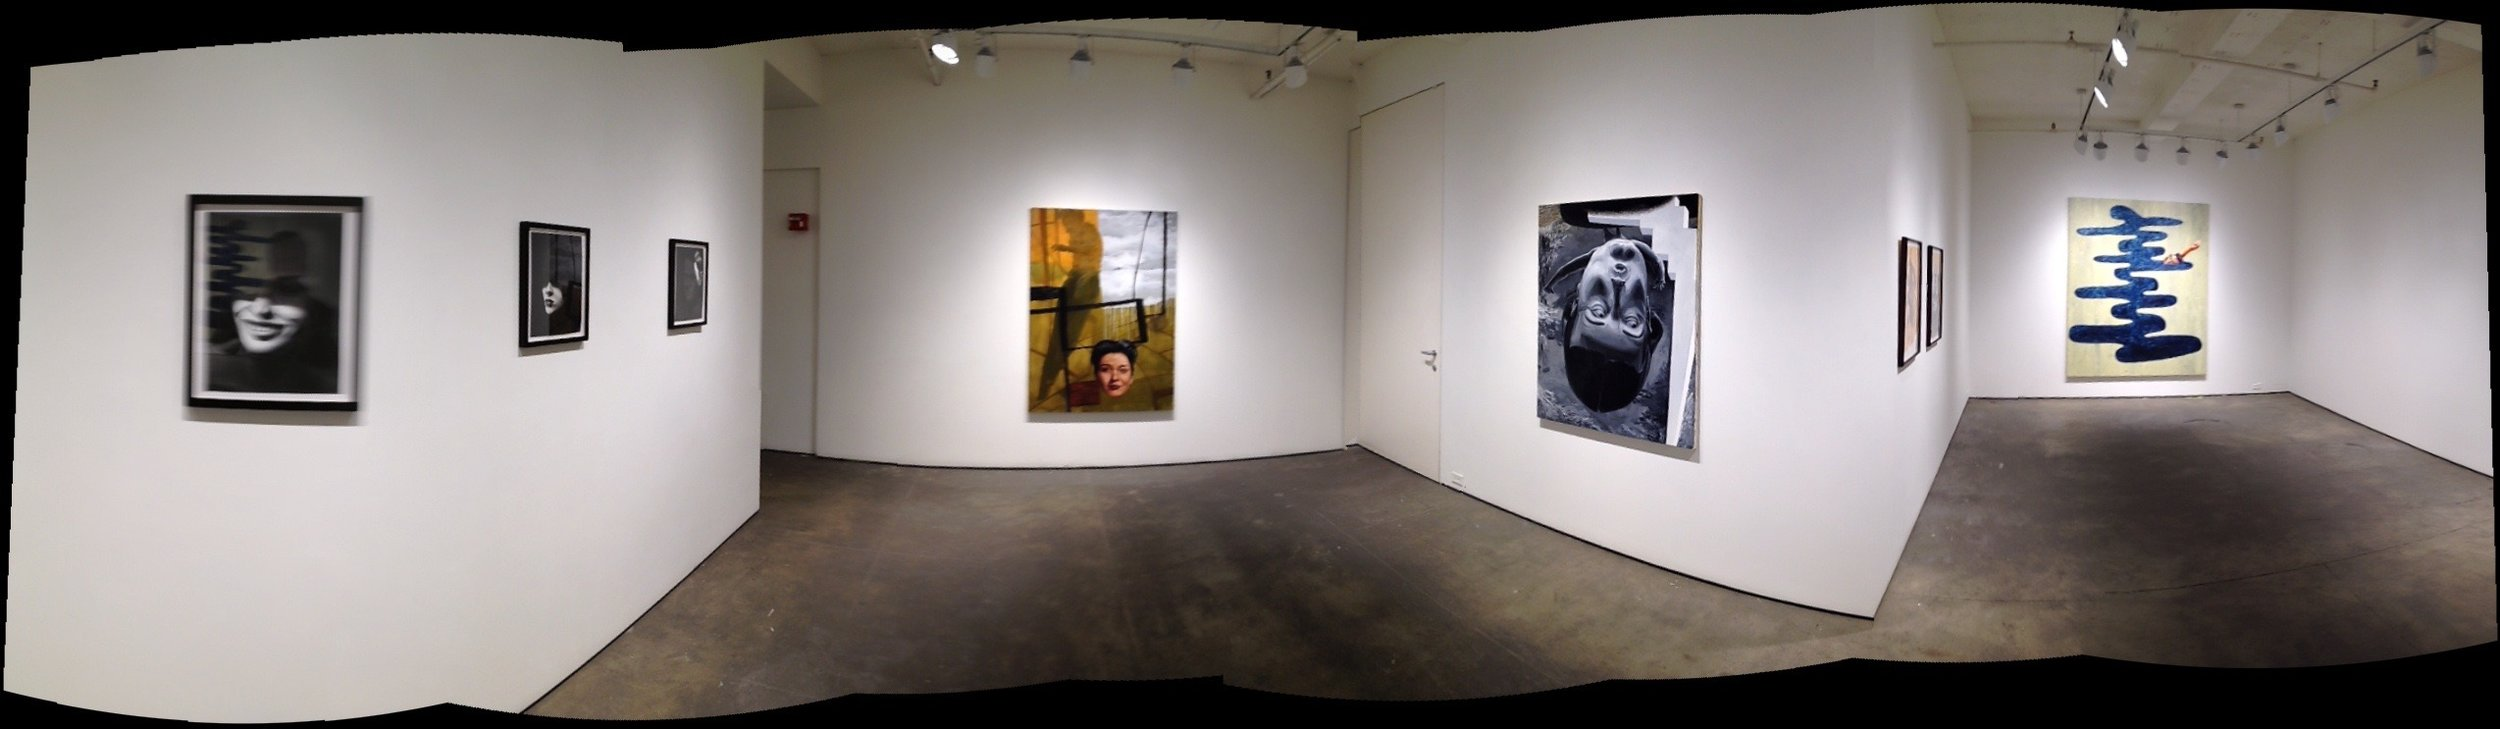 2012 Show Elizabeth Harris Gallery